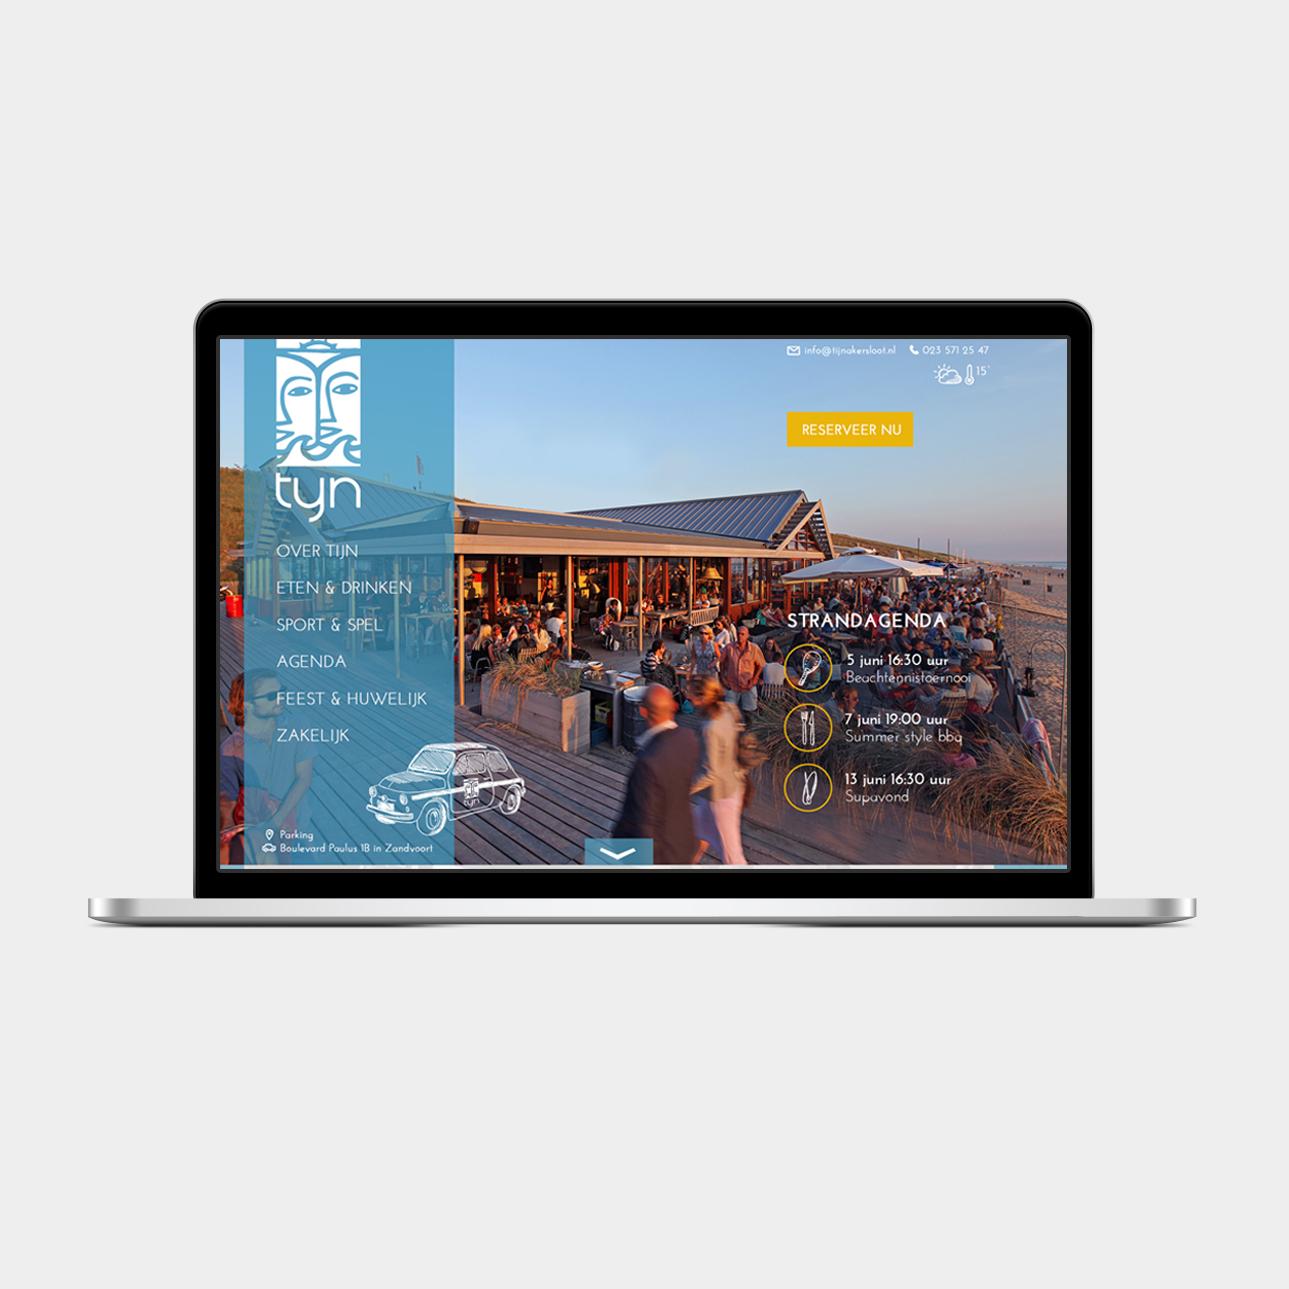 tijn-akersloot-webdesign-illustratie